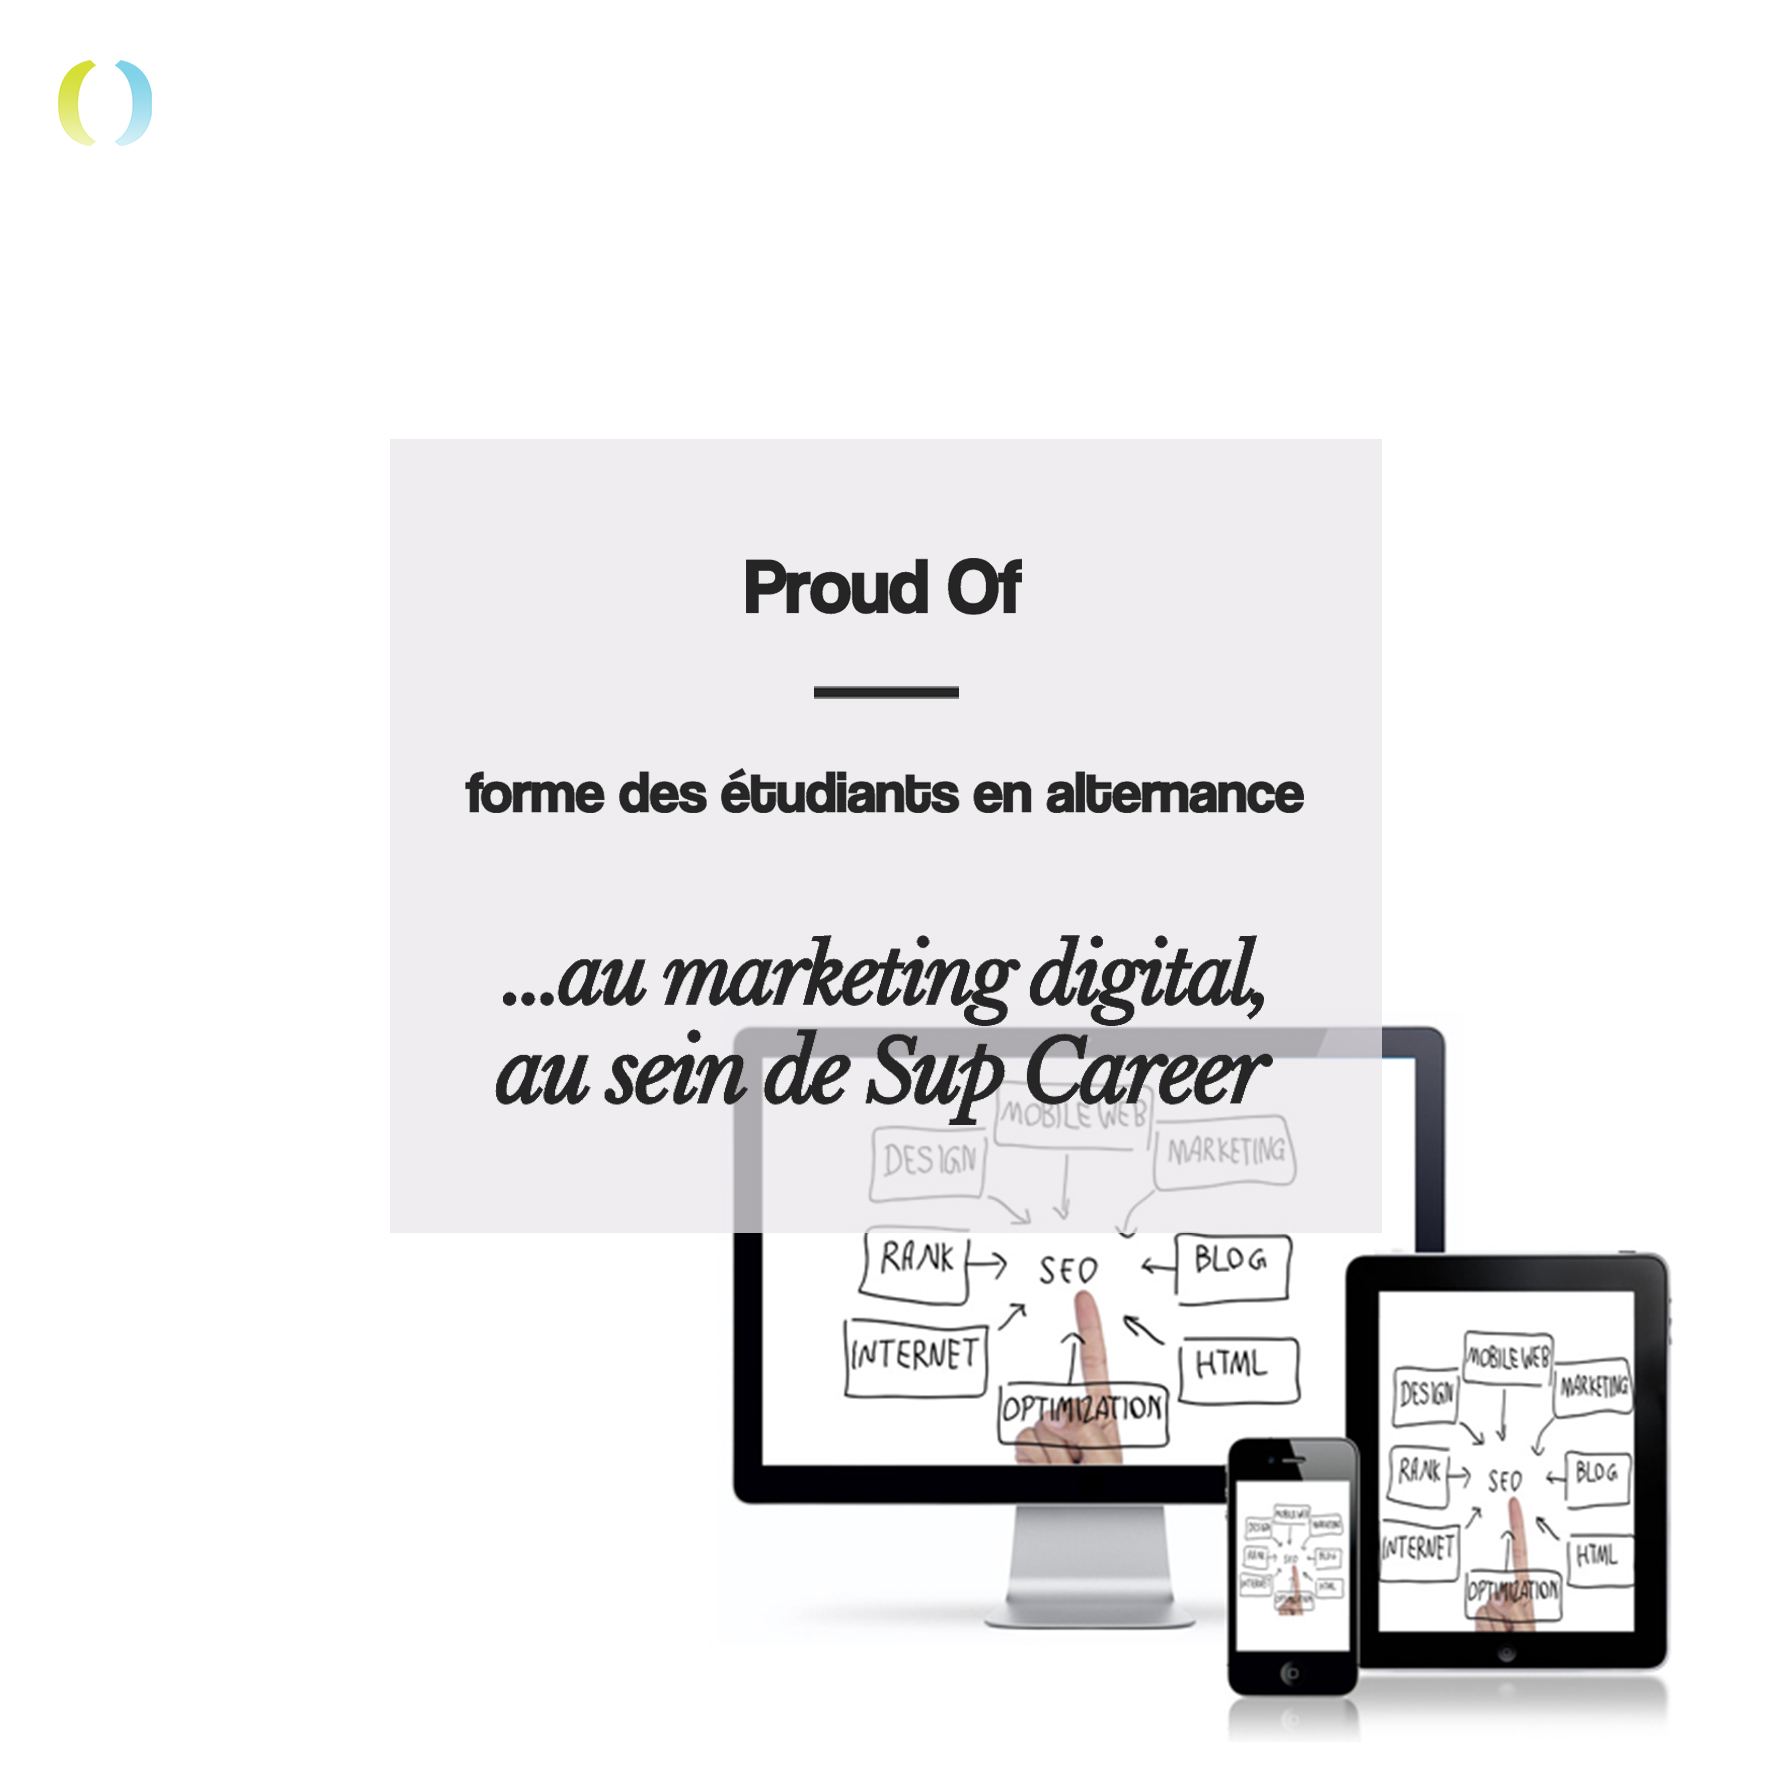 Proud Of - Catherine Galice - Home - Proud Of forme des étudiants en alternance au marketing digital au sein de Sup Career